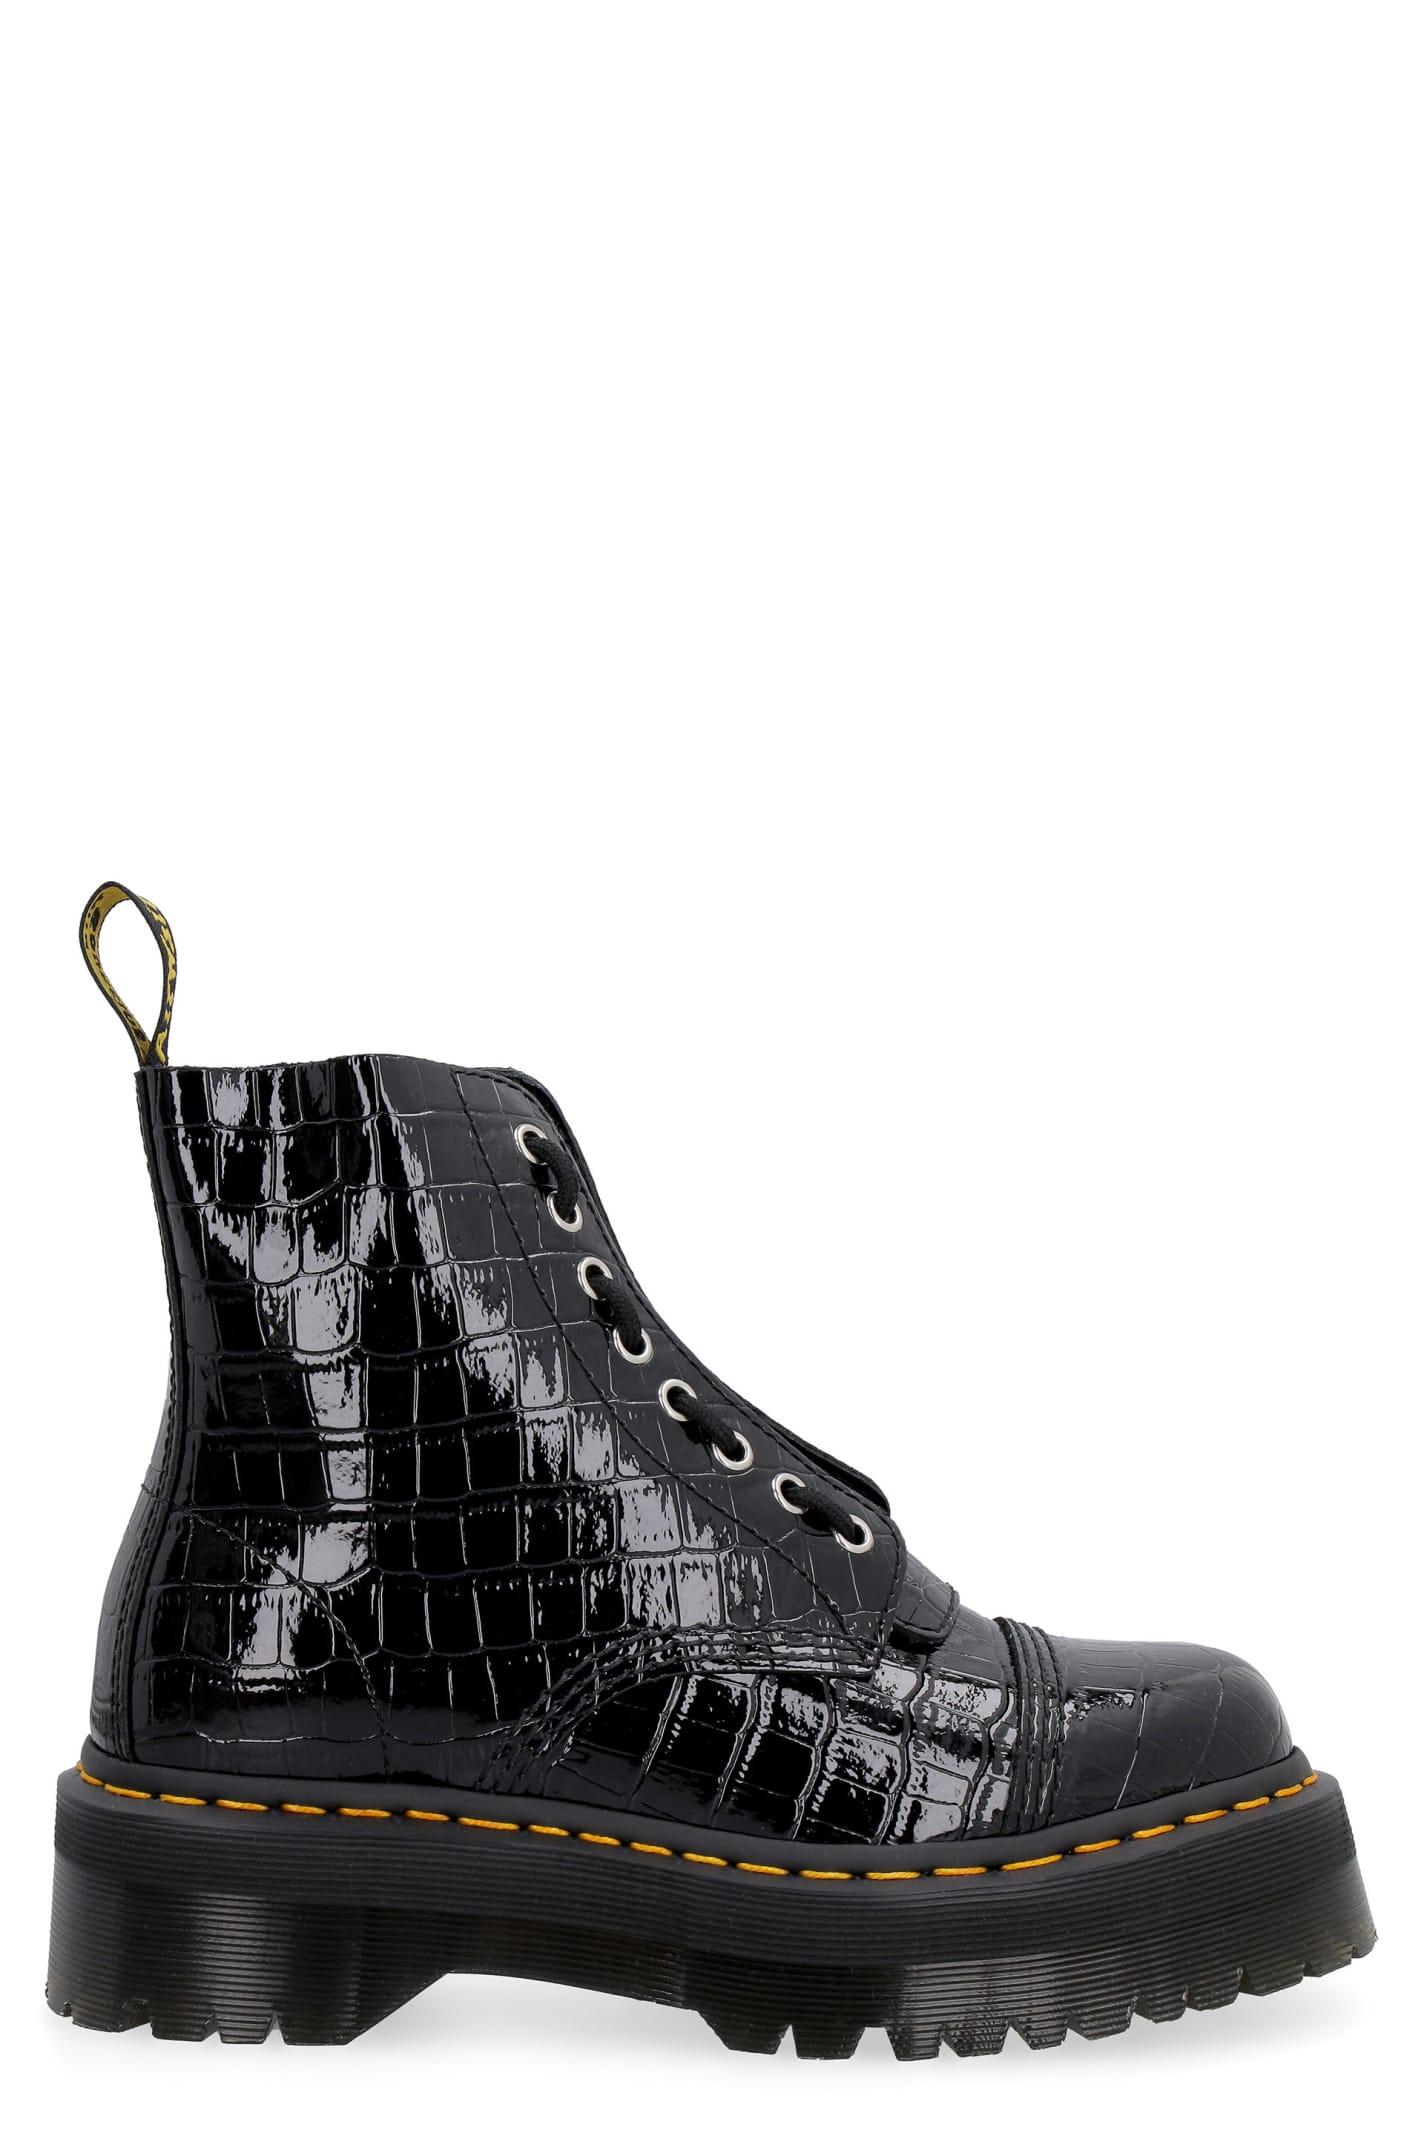 Dr. Martens Sinclair Hi Max Pebbled Leather Boots